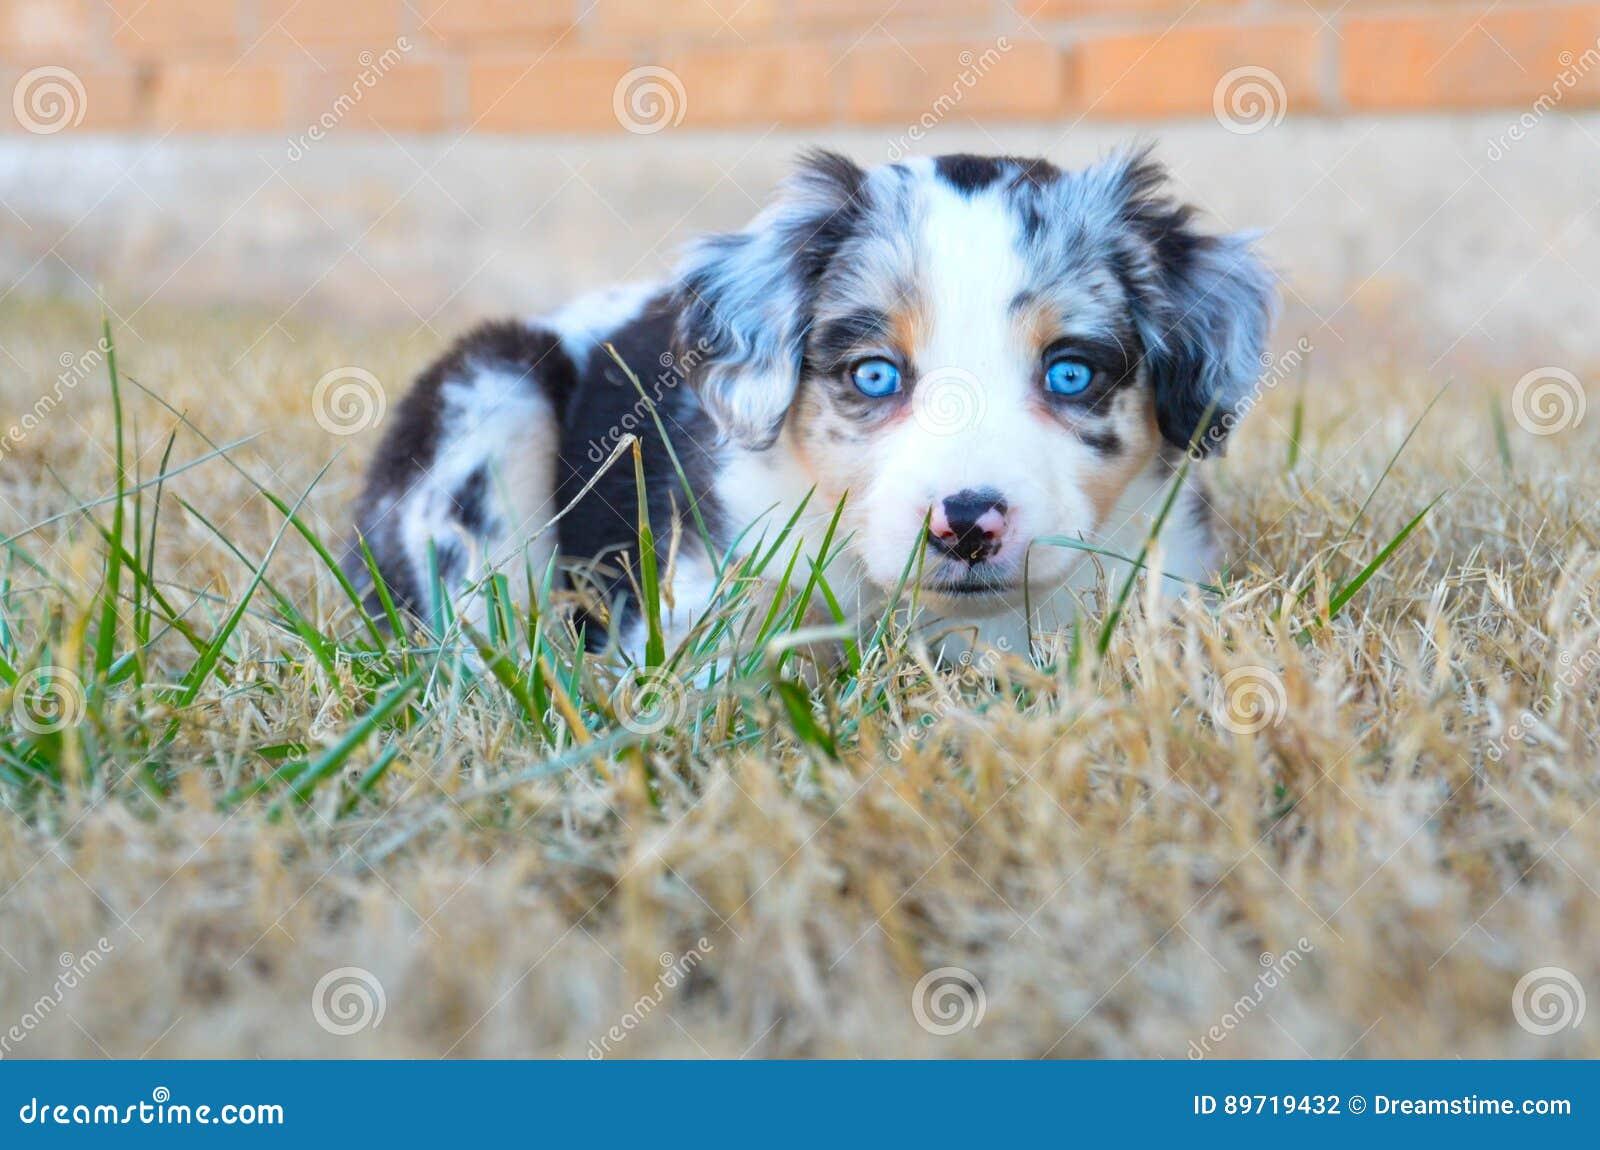 Australian Shepherd Puppy Blue Merle Stock Photo Image Of Coat Pink 89719432